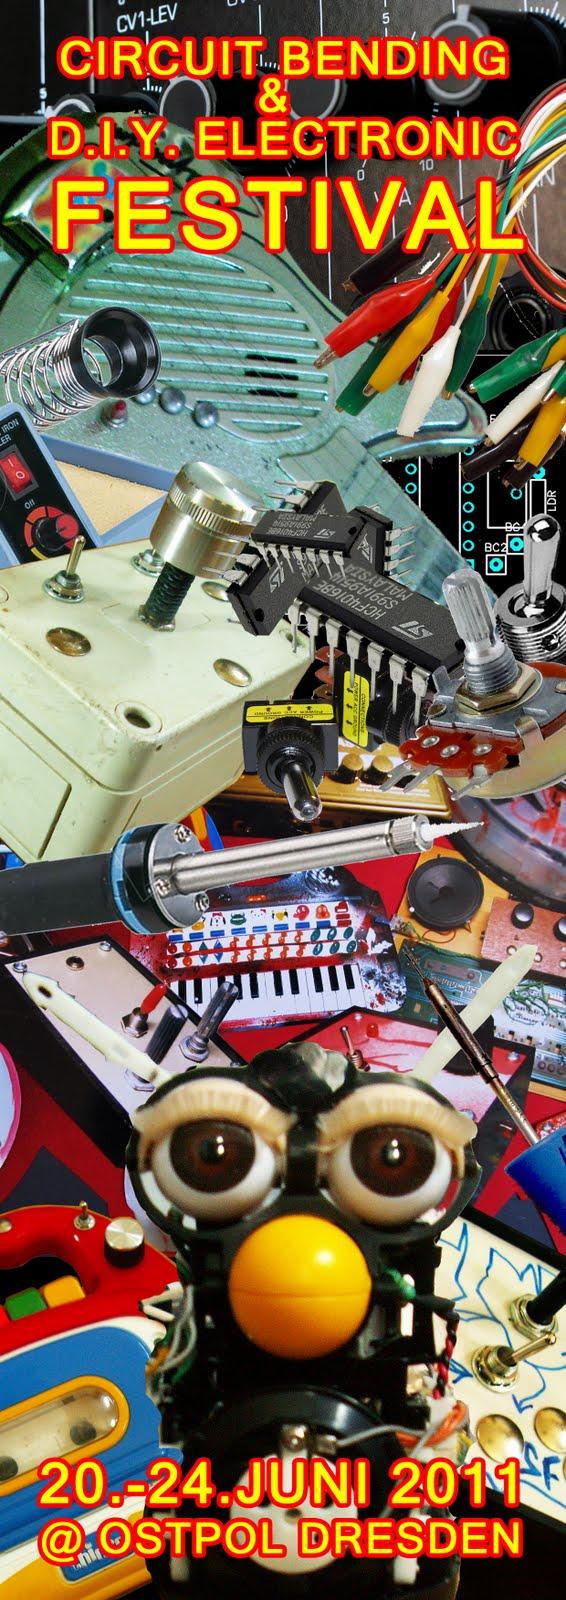 Schrgerunde 20 2462011 1diy Electronic Circuit Bending How To Build Diy Festival Dresden